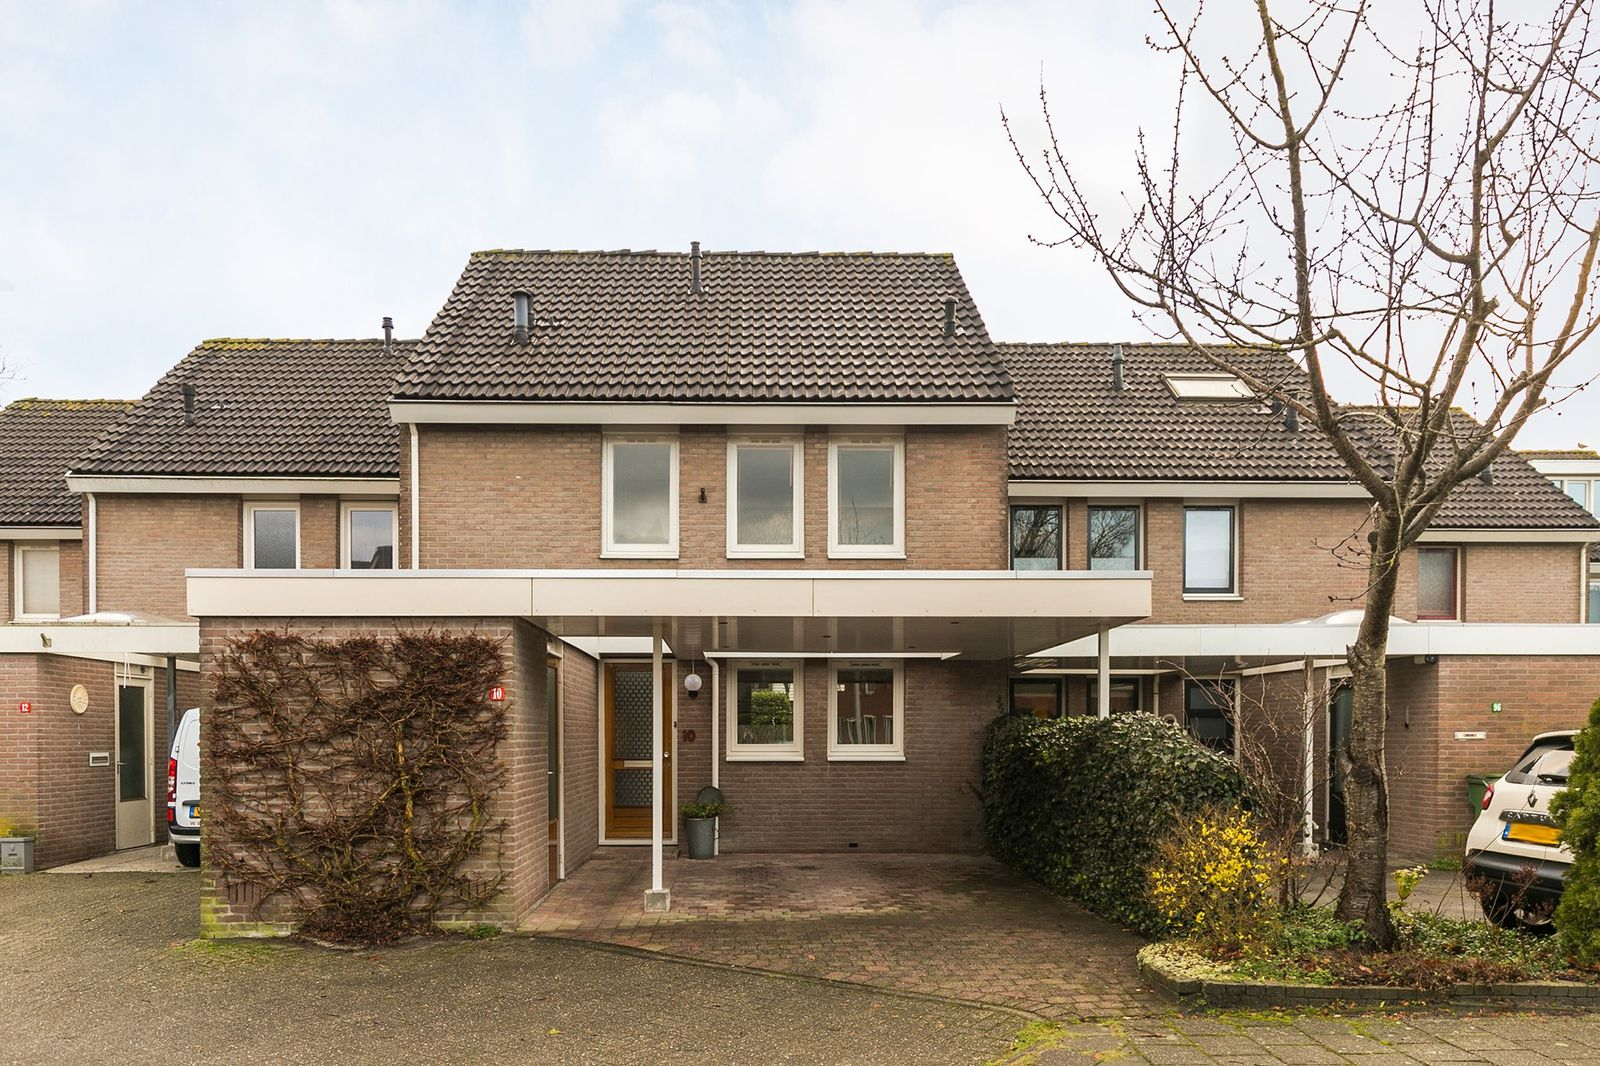 Swammerdamstraat 10, Hoogeveen